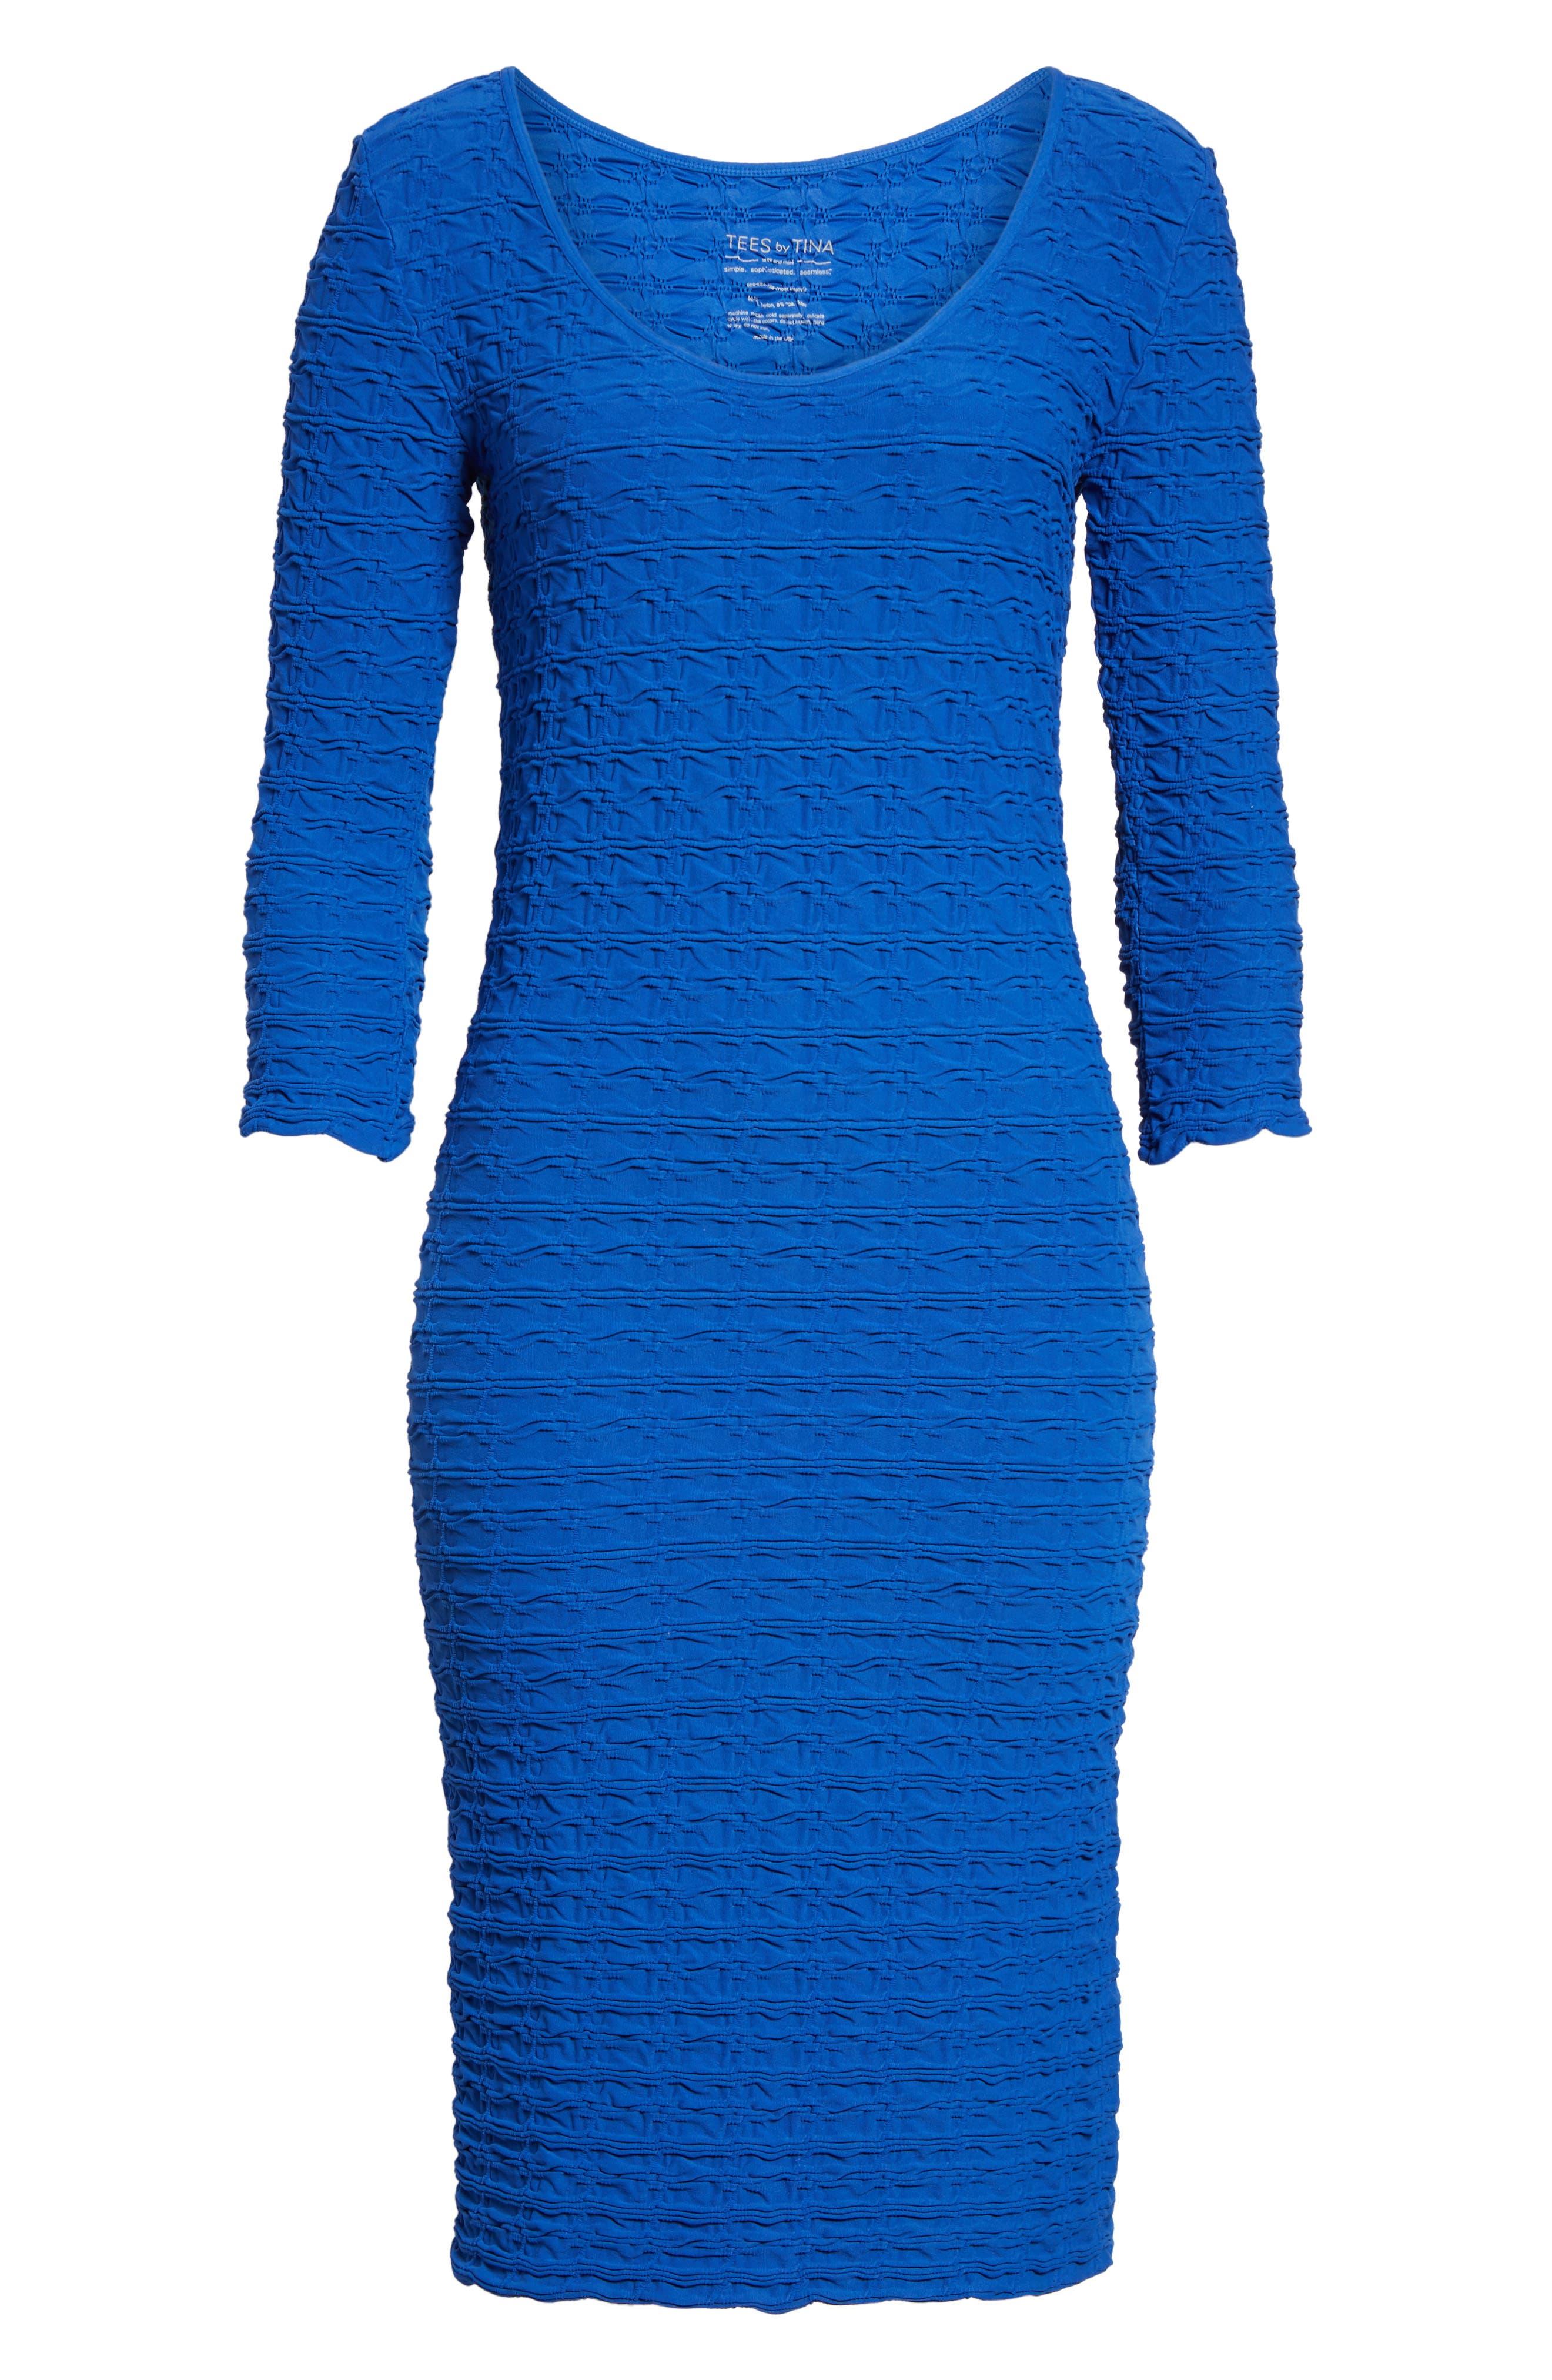 TEES BY TINA,                             Crinkle Maternity Sheath Dress,                             Alternate thumbnail 6, color,                             400